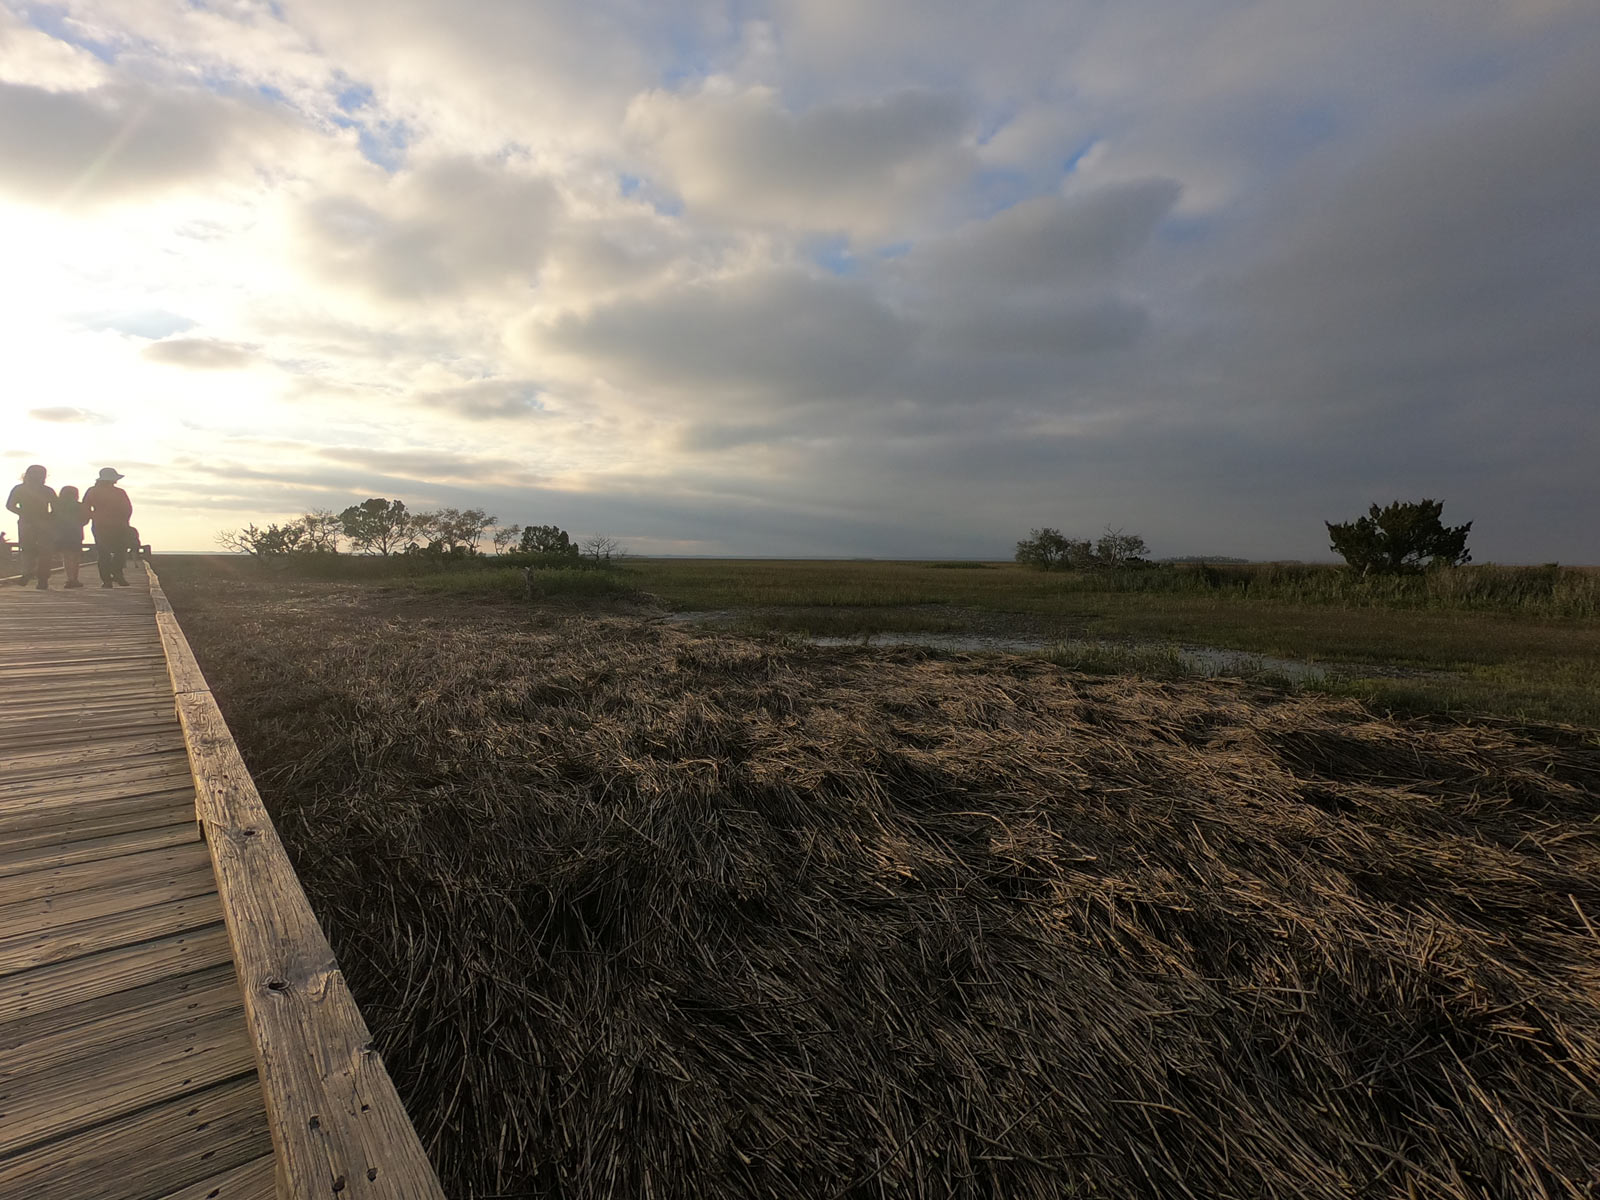 Marshwalk Boardwalk Trail at sunset on Hunting Island State Park, South Carolina